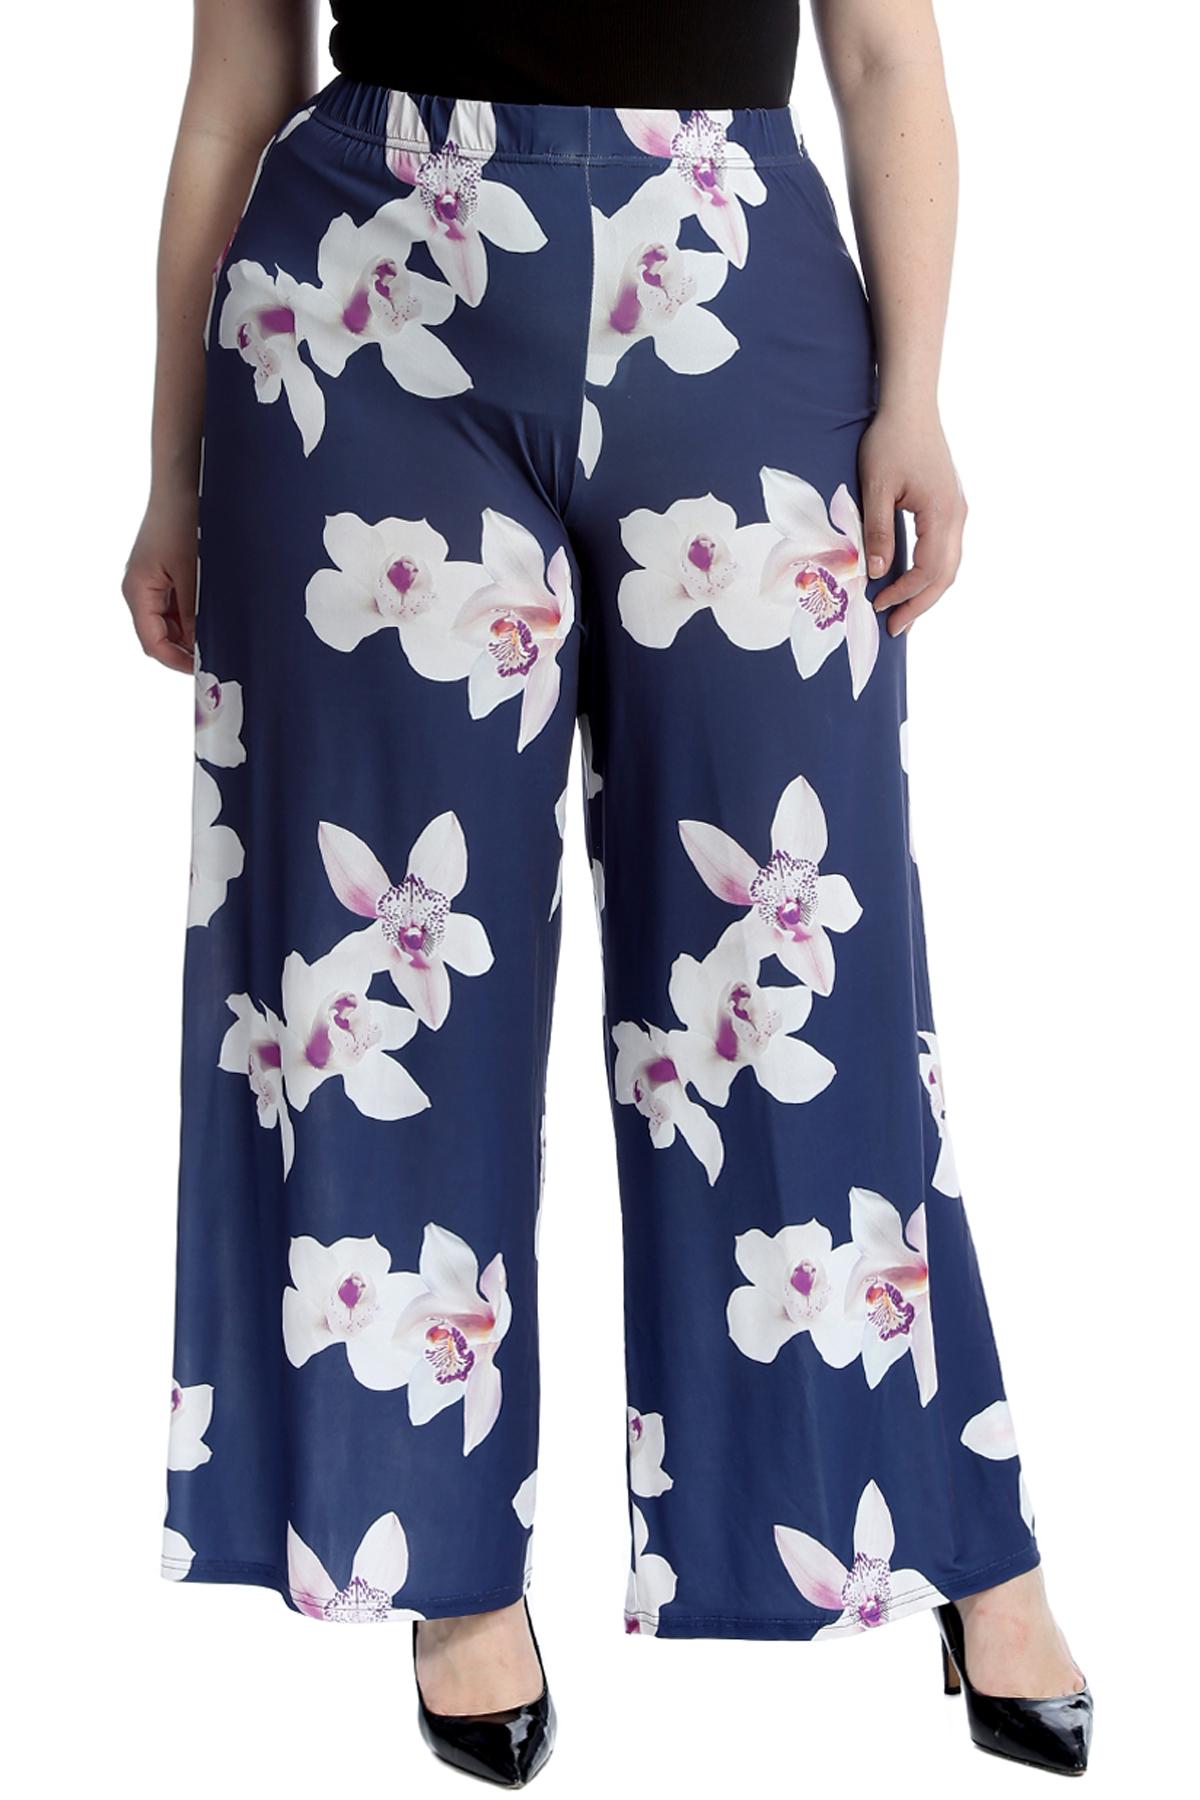 WOMEN LADIES FLORAL PRINT PALAZZO TROUSERS SUMMER WIDE LEG PANTS PLUS SIZE 8 26